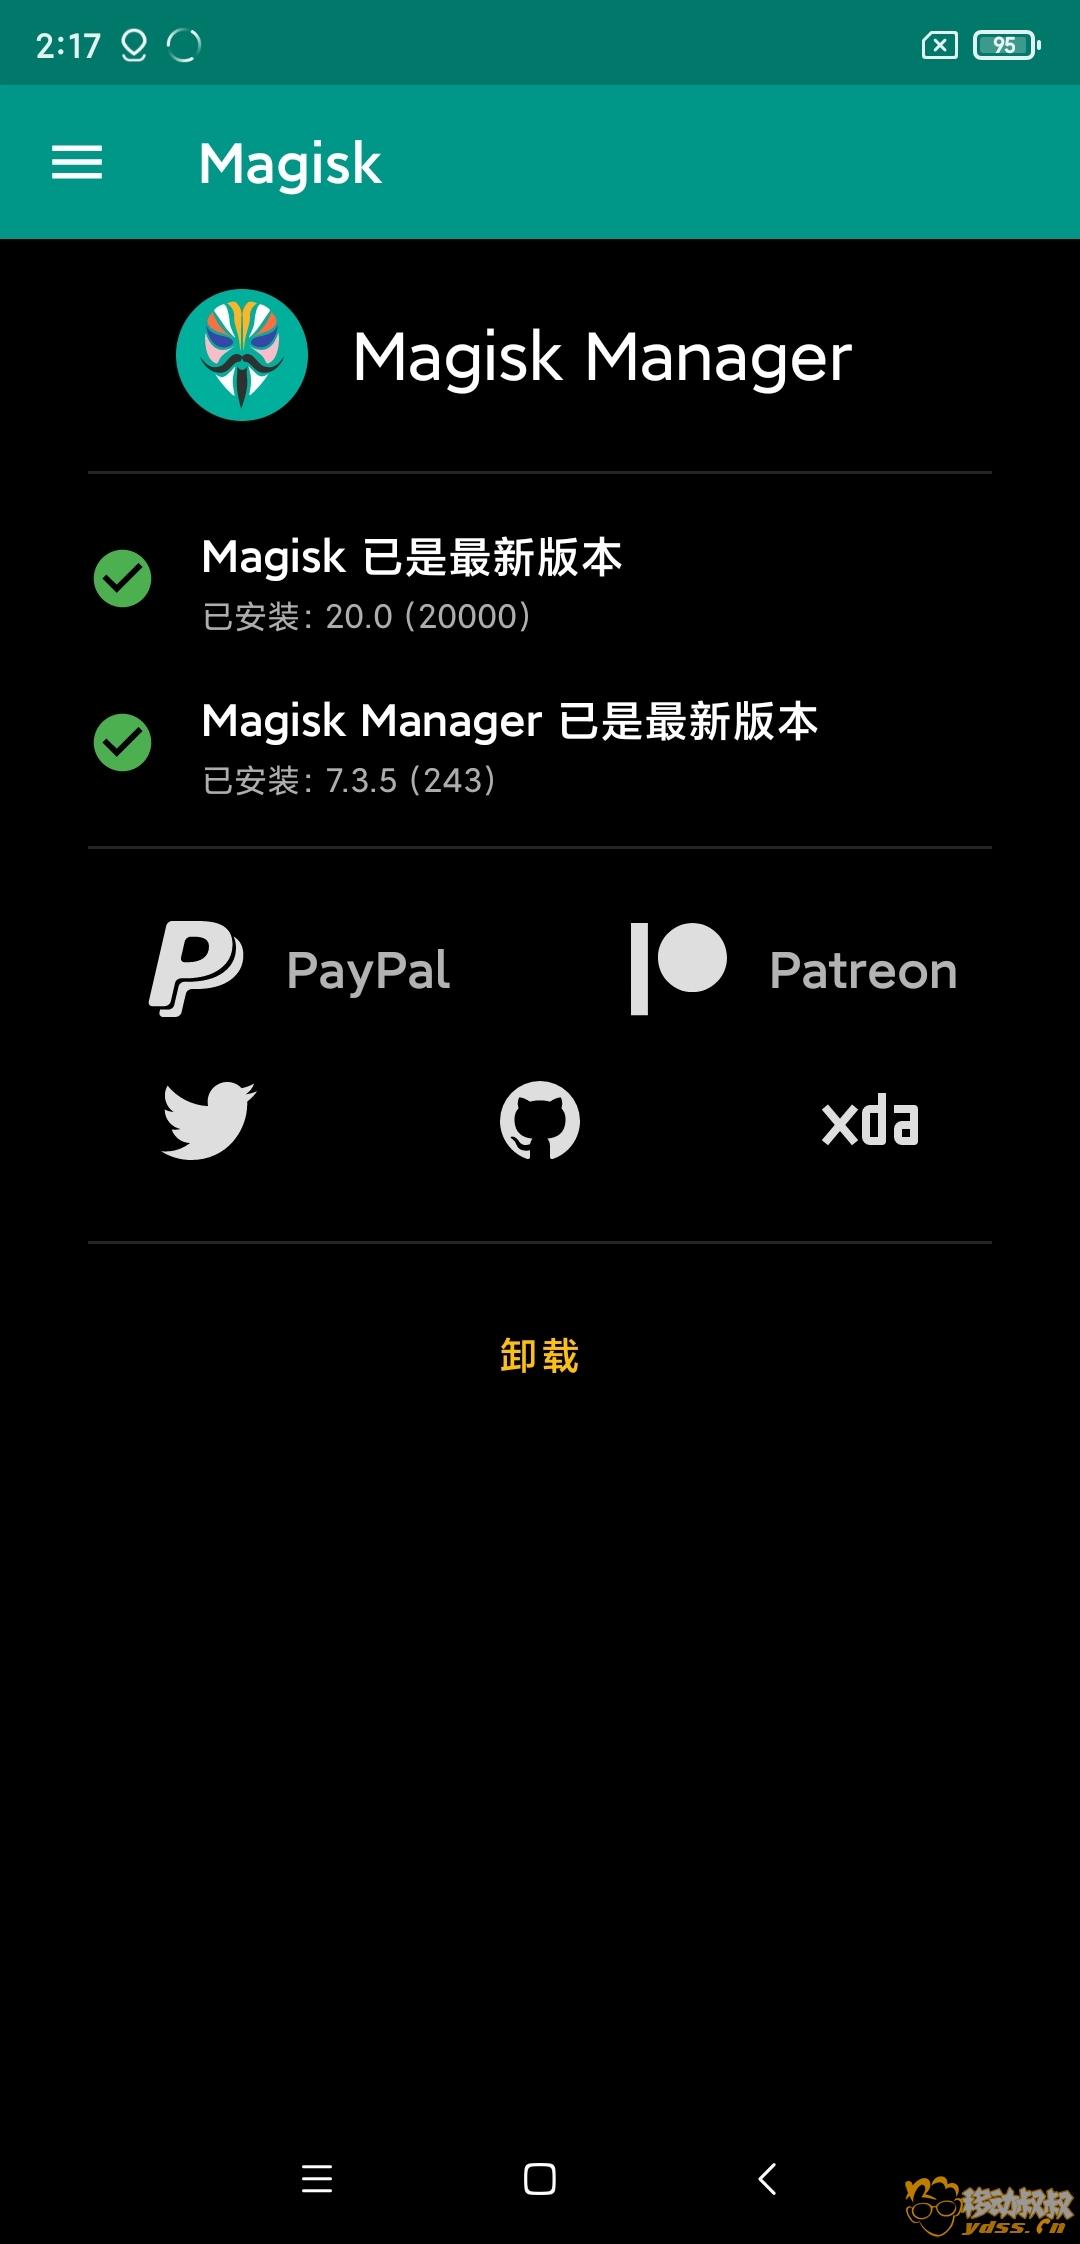 Screenshot_2020-01-20-02-17-45-394_com.topjohnwu.magisk.jpg